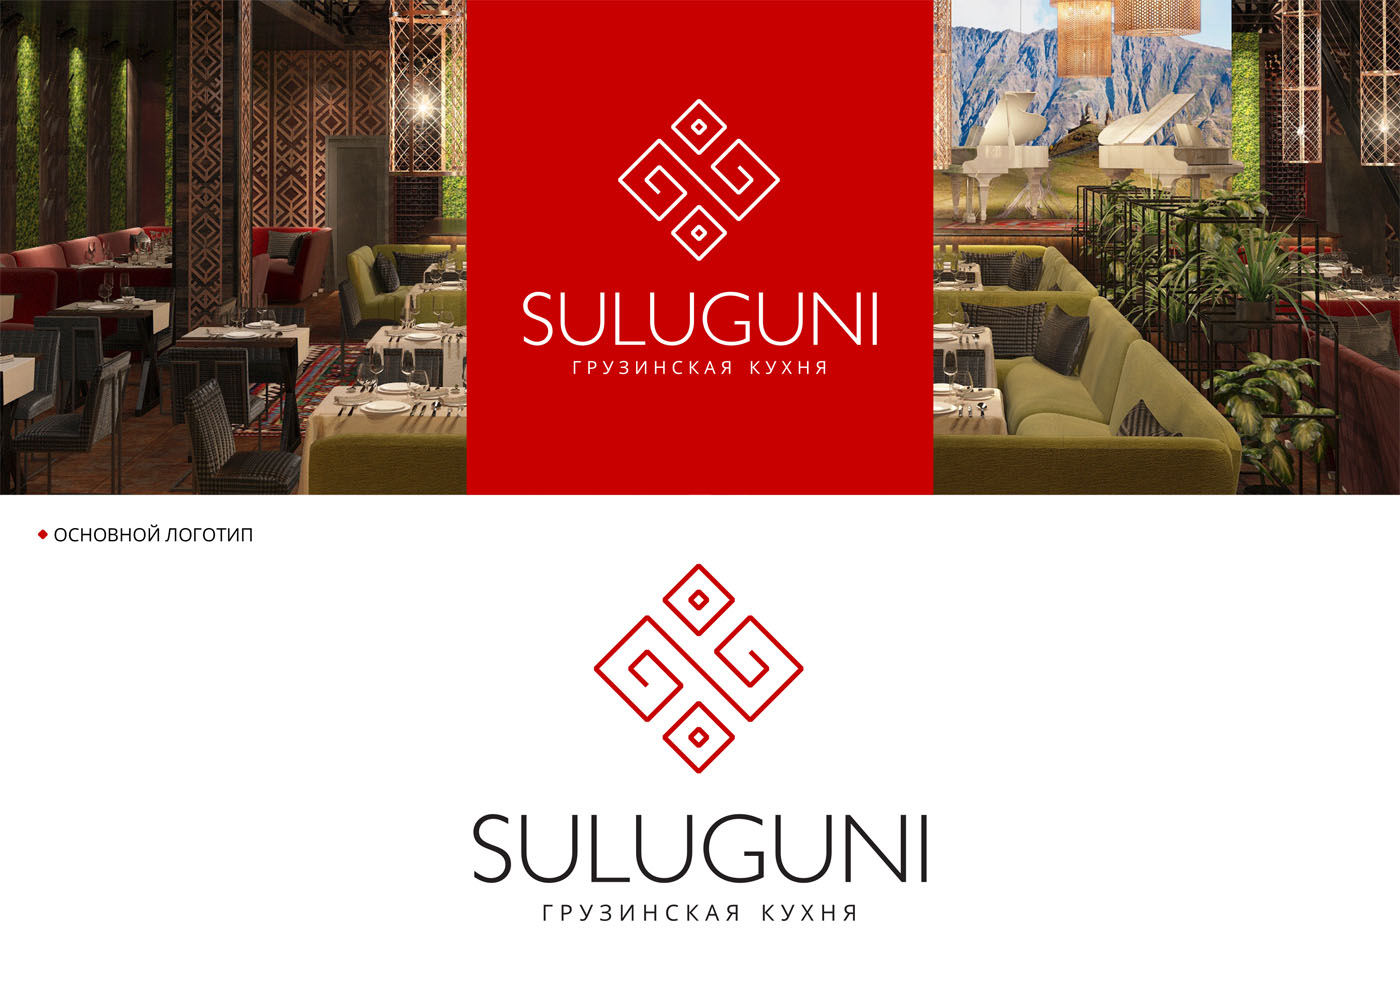 Brand identity and logo for Suluguni, a restaurant of Georgian cuisine in Kyiv